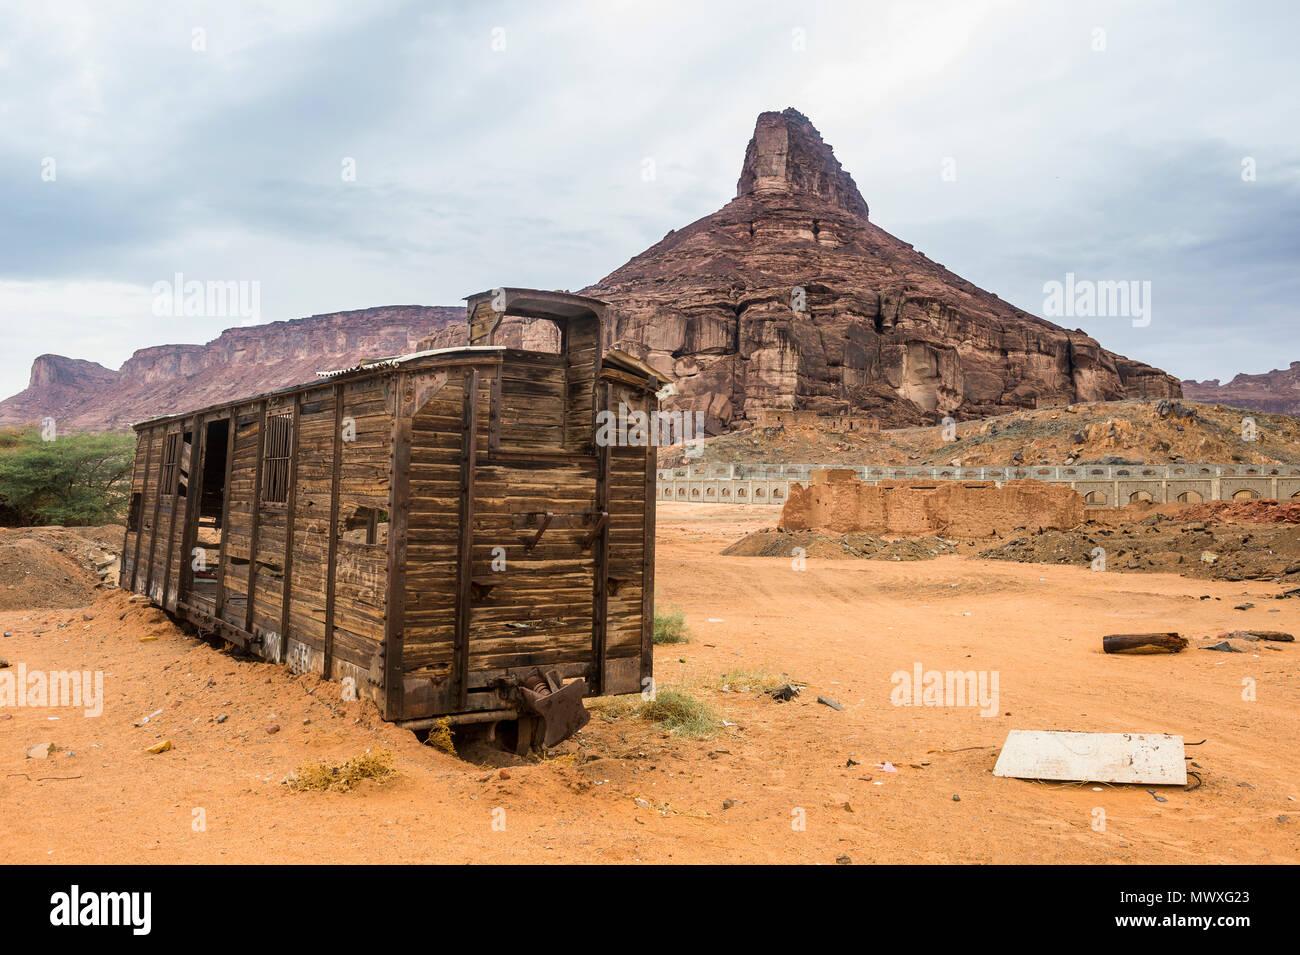 Old wagon in the sand, Hijaz railway station, Al Ula, Saudi Arabia, Middle East - Stock Image